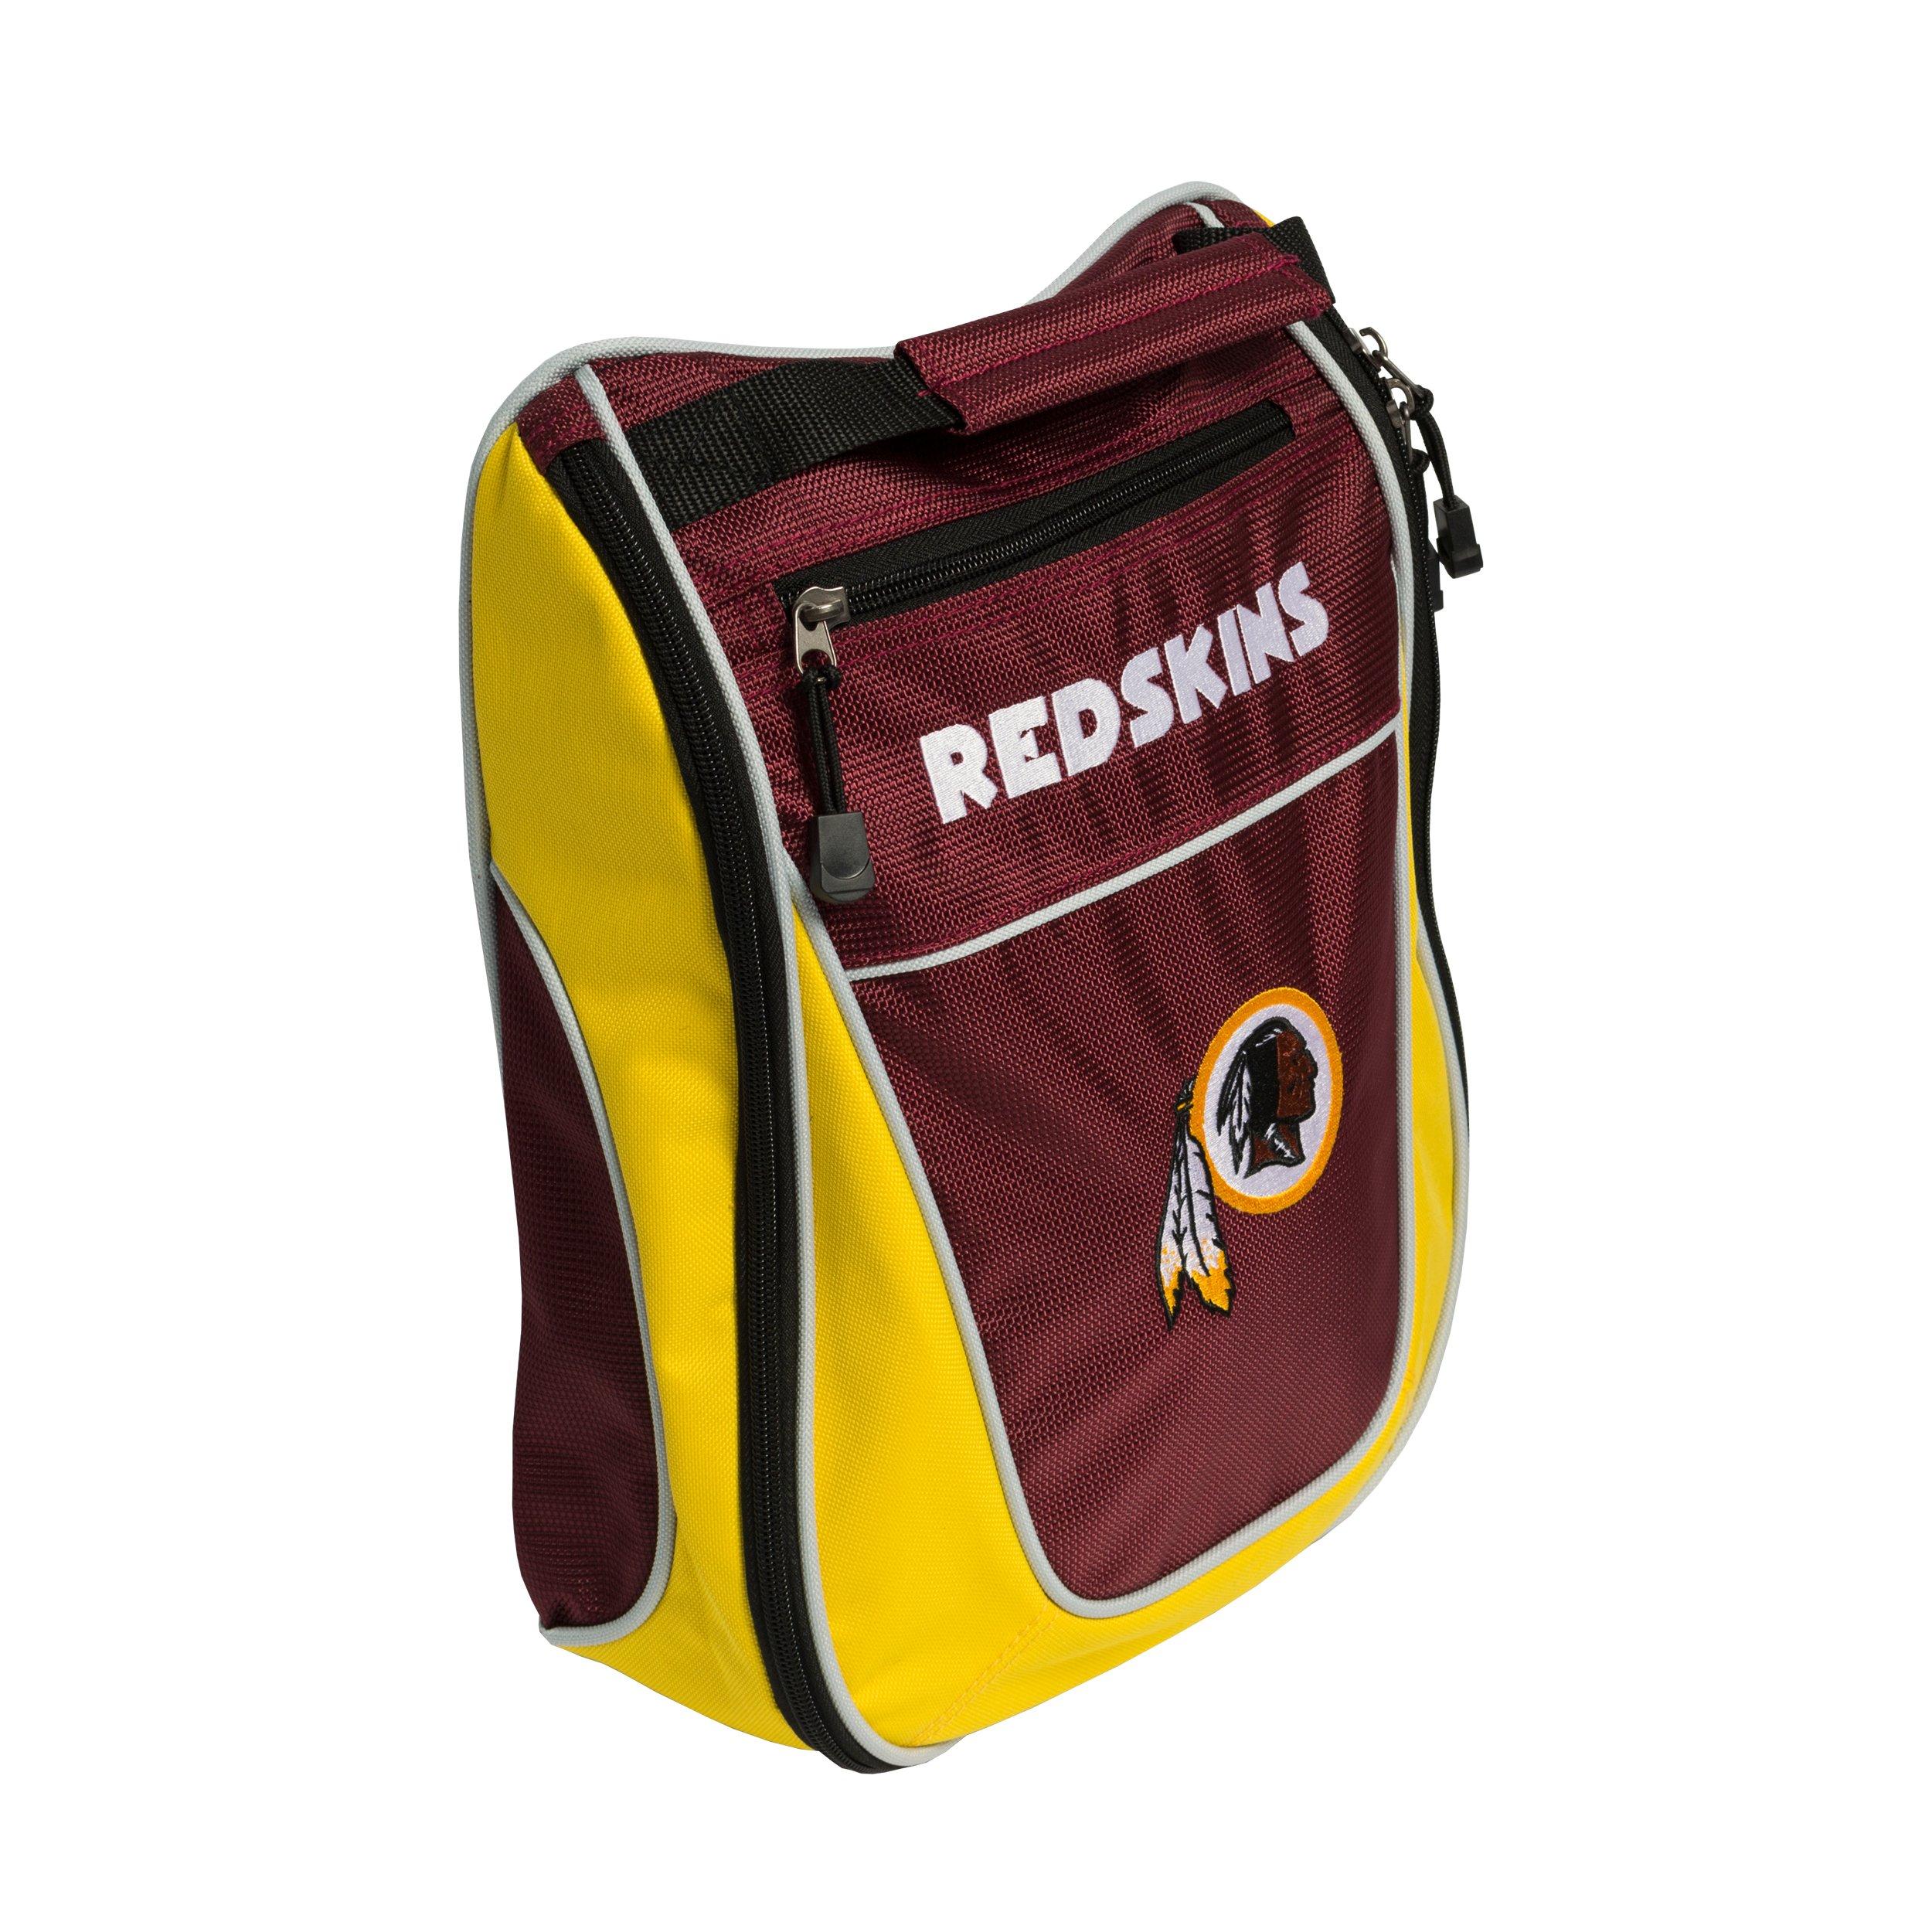 Team Golf NFL Washington Redskins Travel Golf Shoe Bag, Reduce Smells, Extra Pocket for Storage, Carry Handle by Team Golf